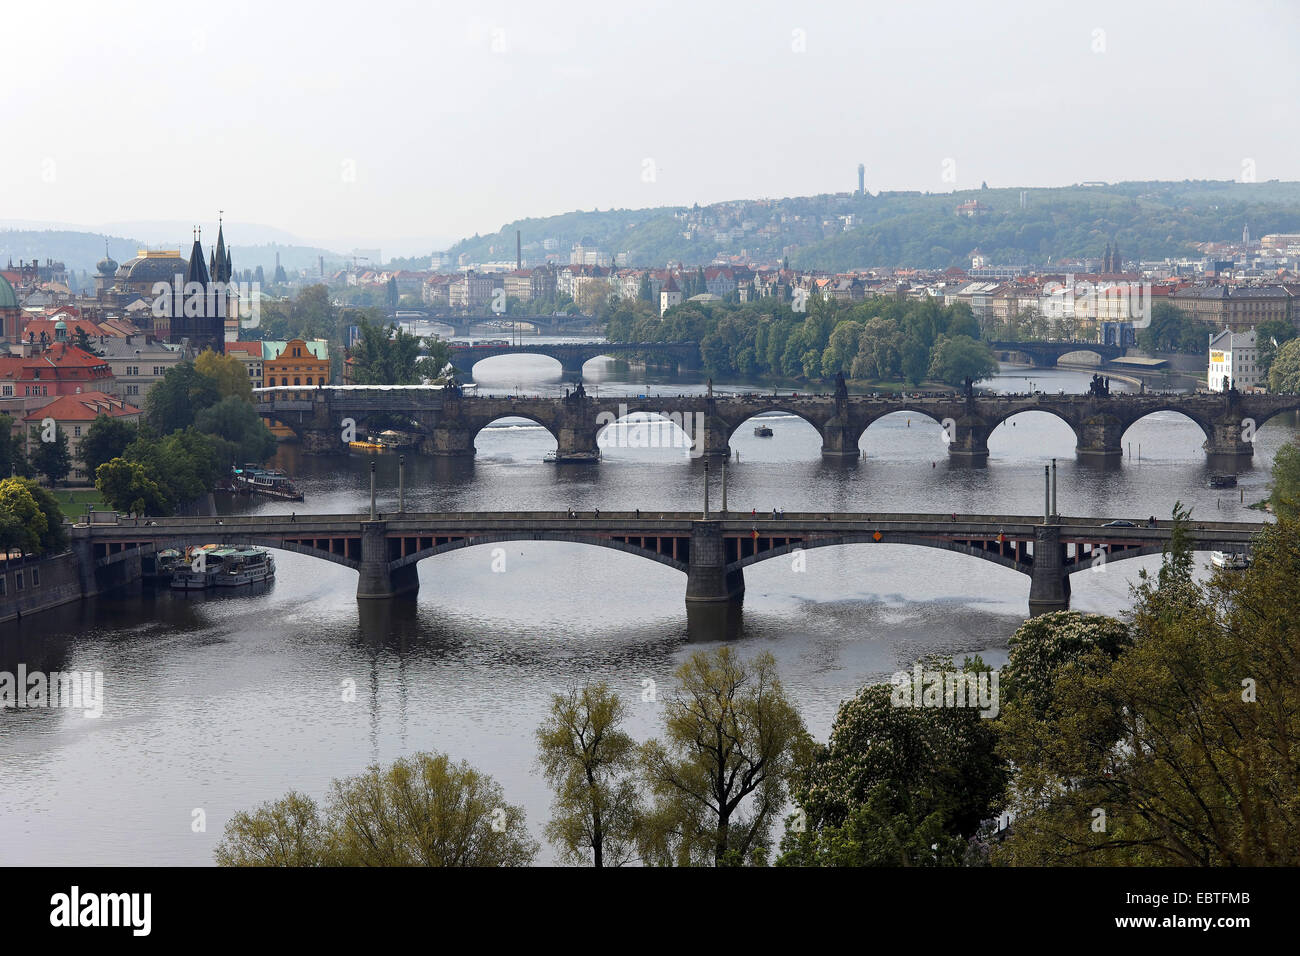 bridges over the Vltava river, Czech Republic, Prague - Stock Image